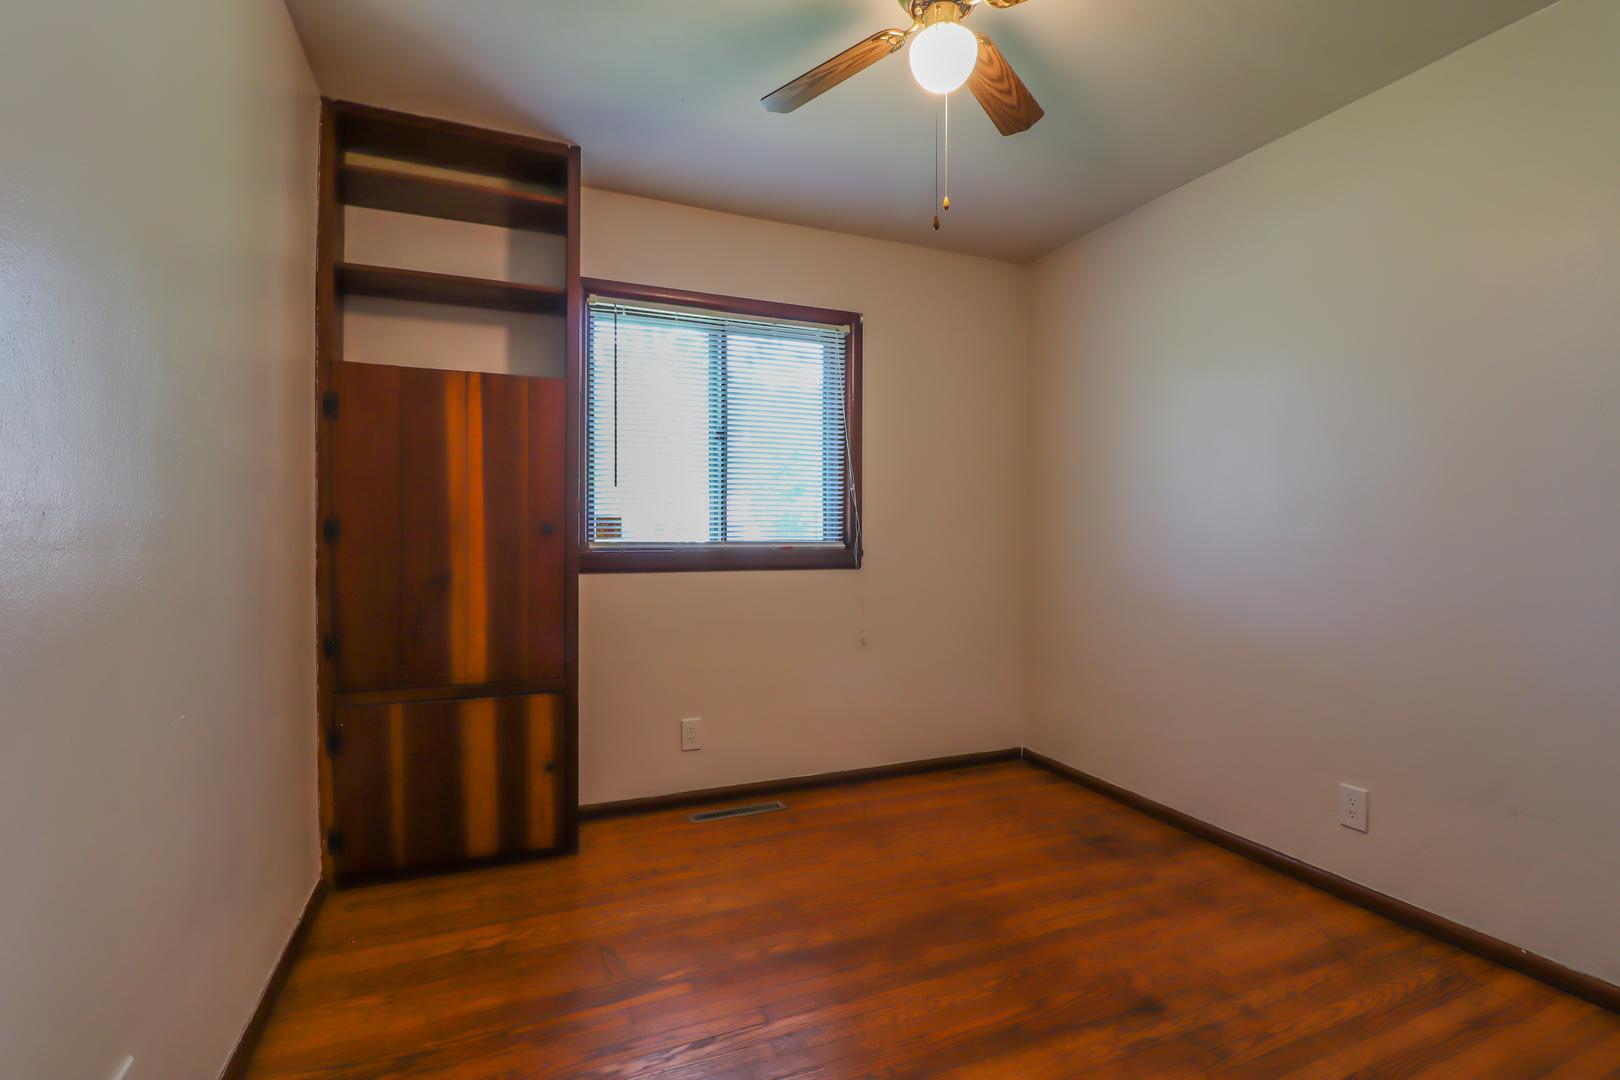 1701 Sandra, Champaign, Illinois, 61821